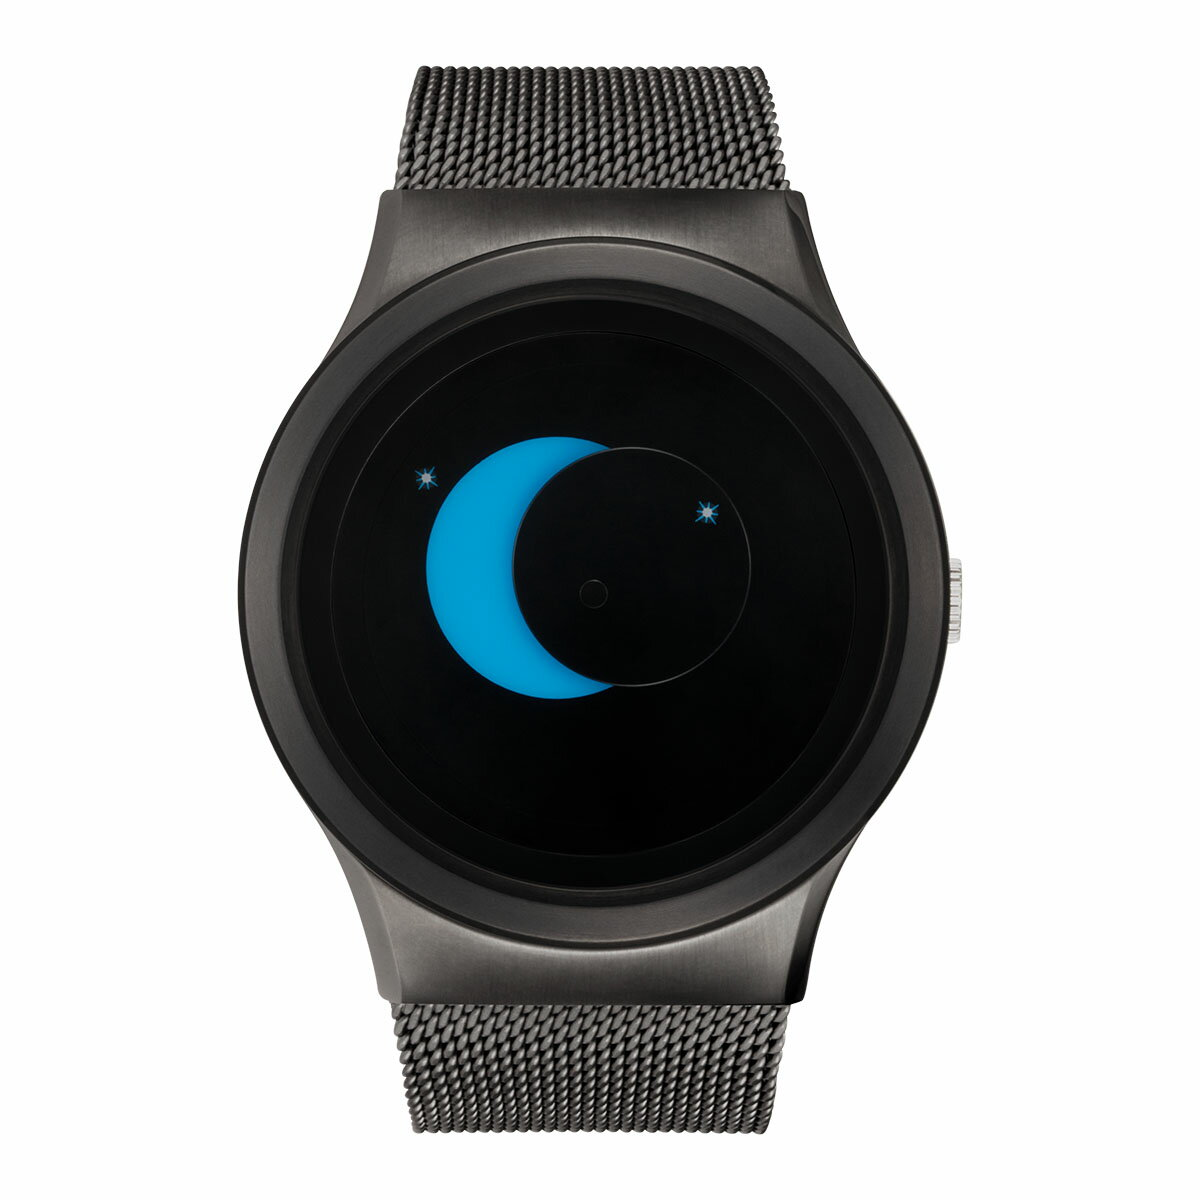 ZEROO SUPER MOON ゼロ 電池式クォーツ 腕時計 [W02006B02SM02] ブルー デザインウォッチ ペア用 メンズ レディース ユニセックス おしゃれ時計 デザイナーズ